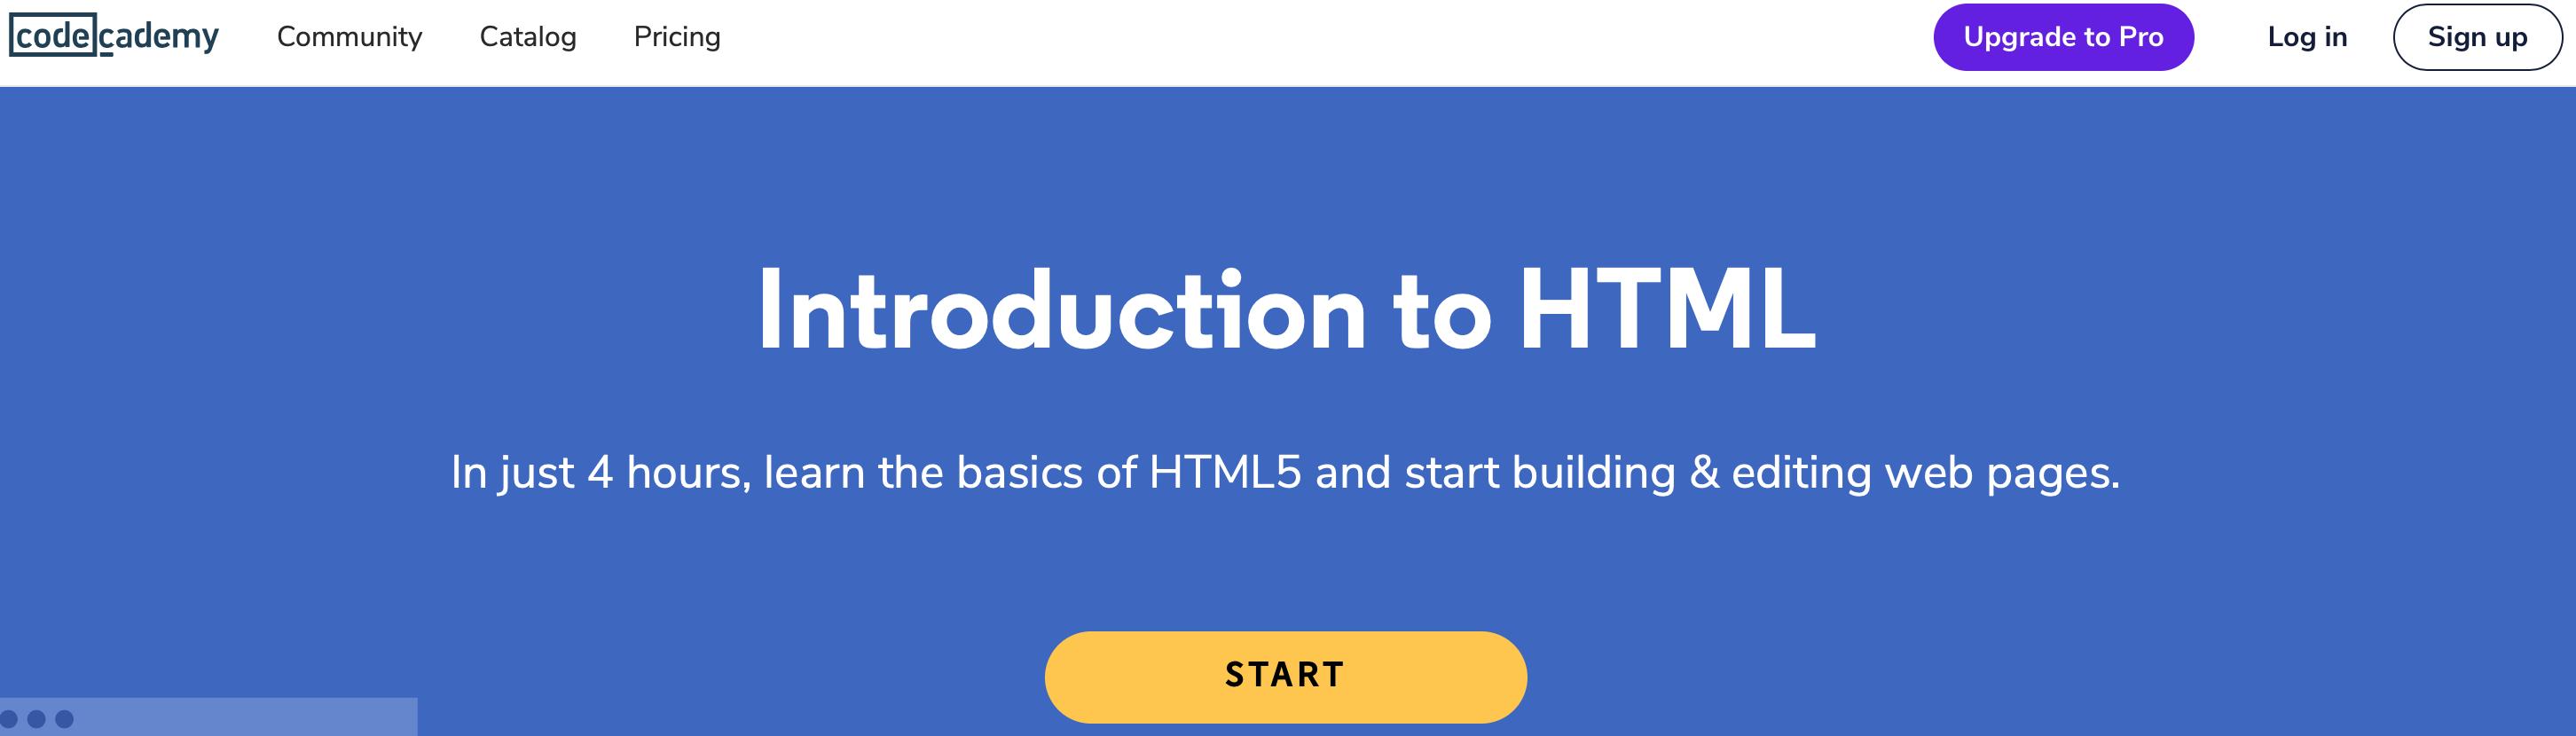 The Codeacademy website homepage.